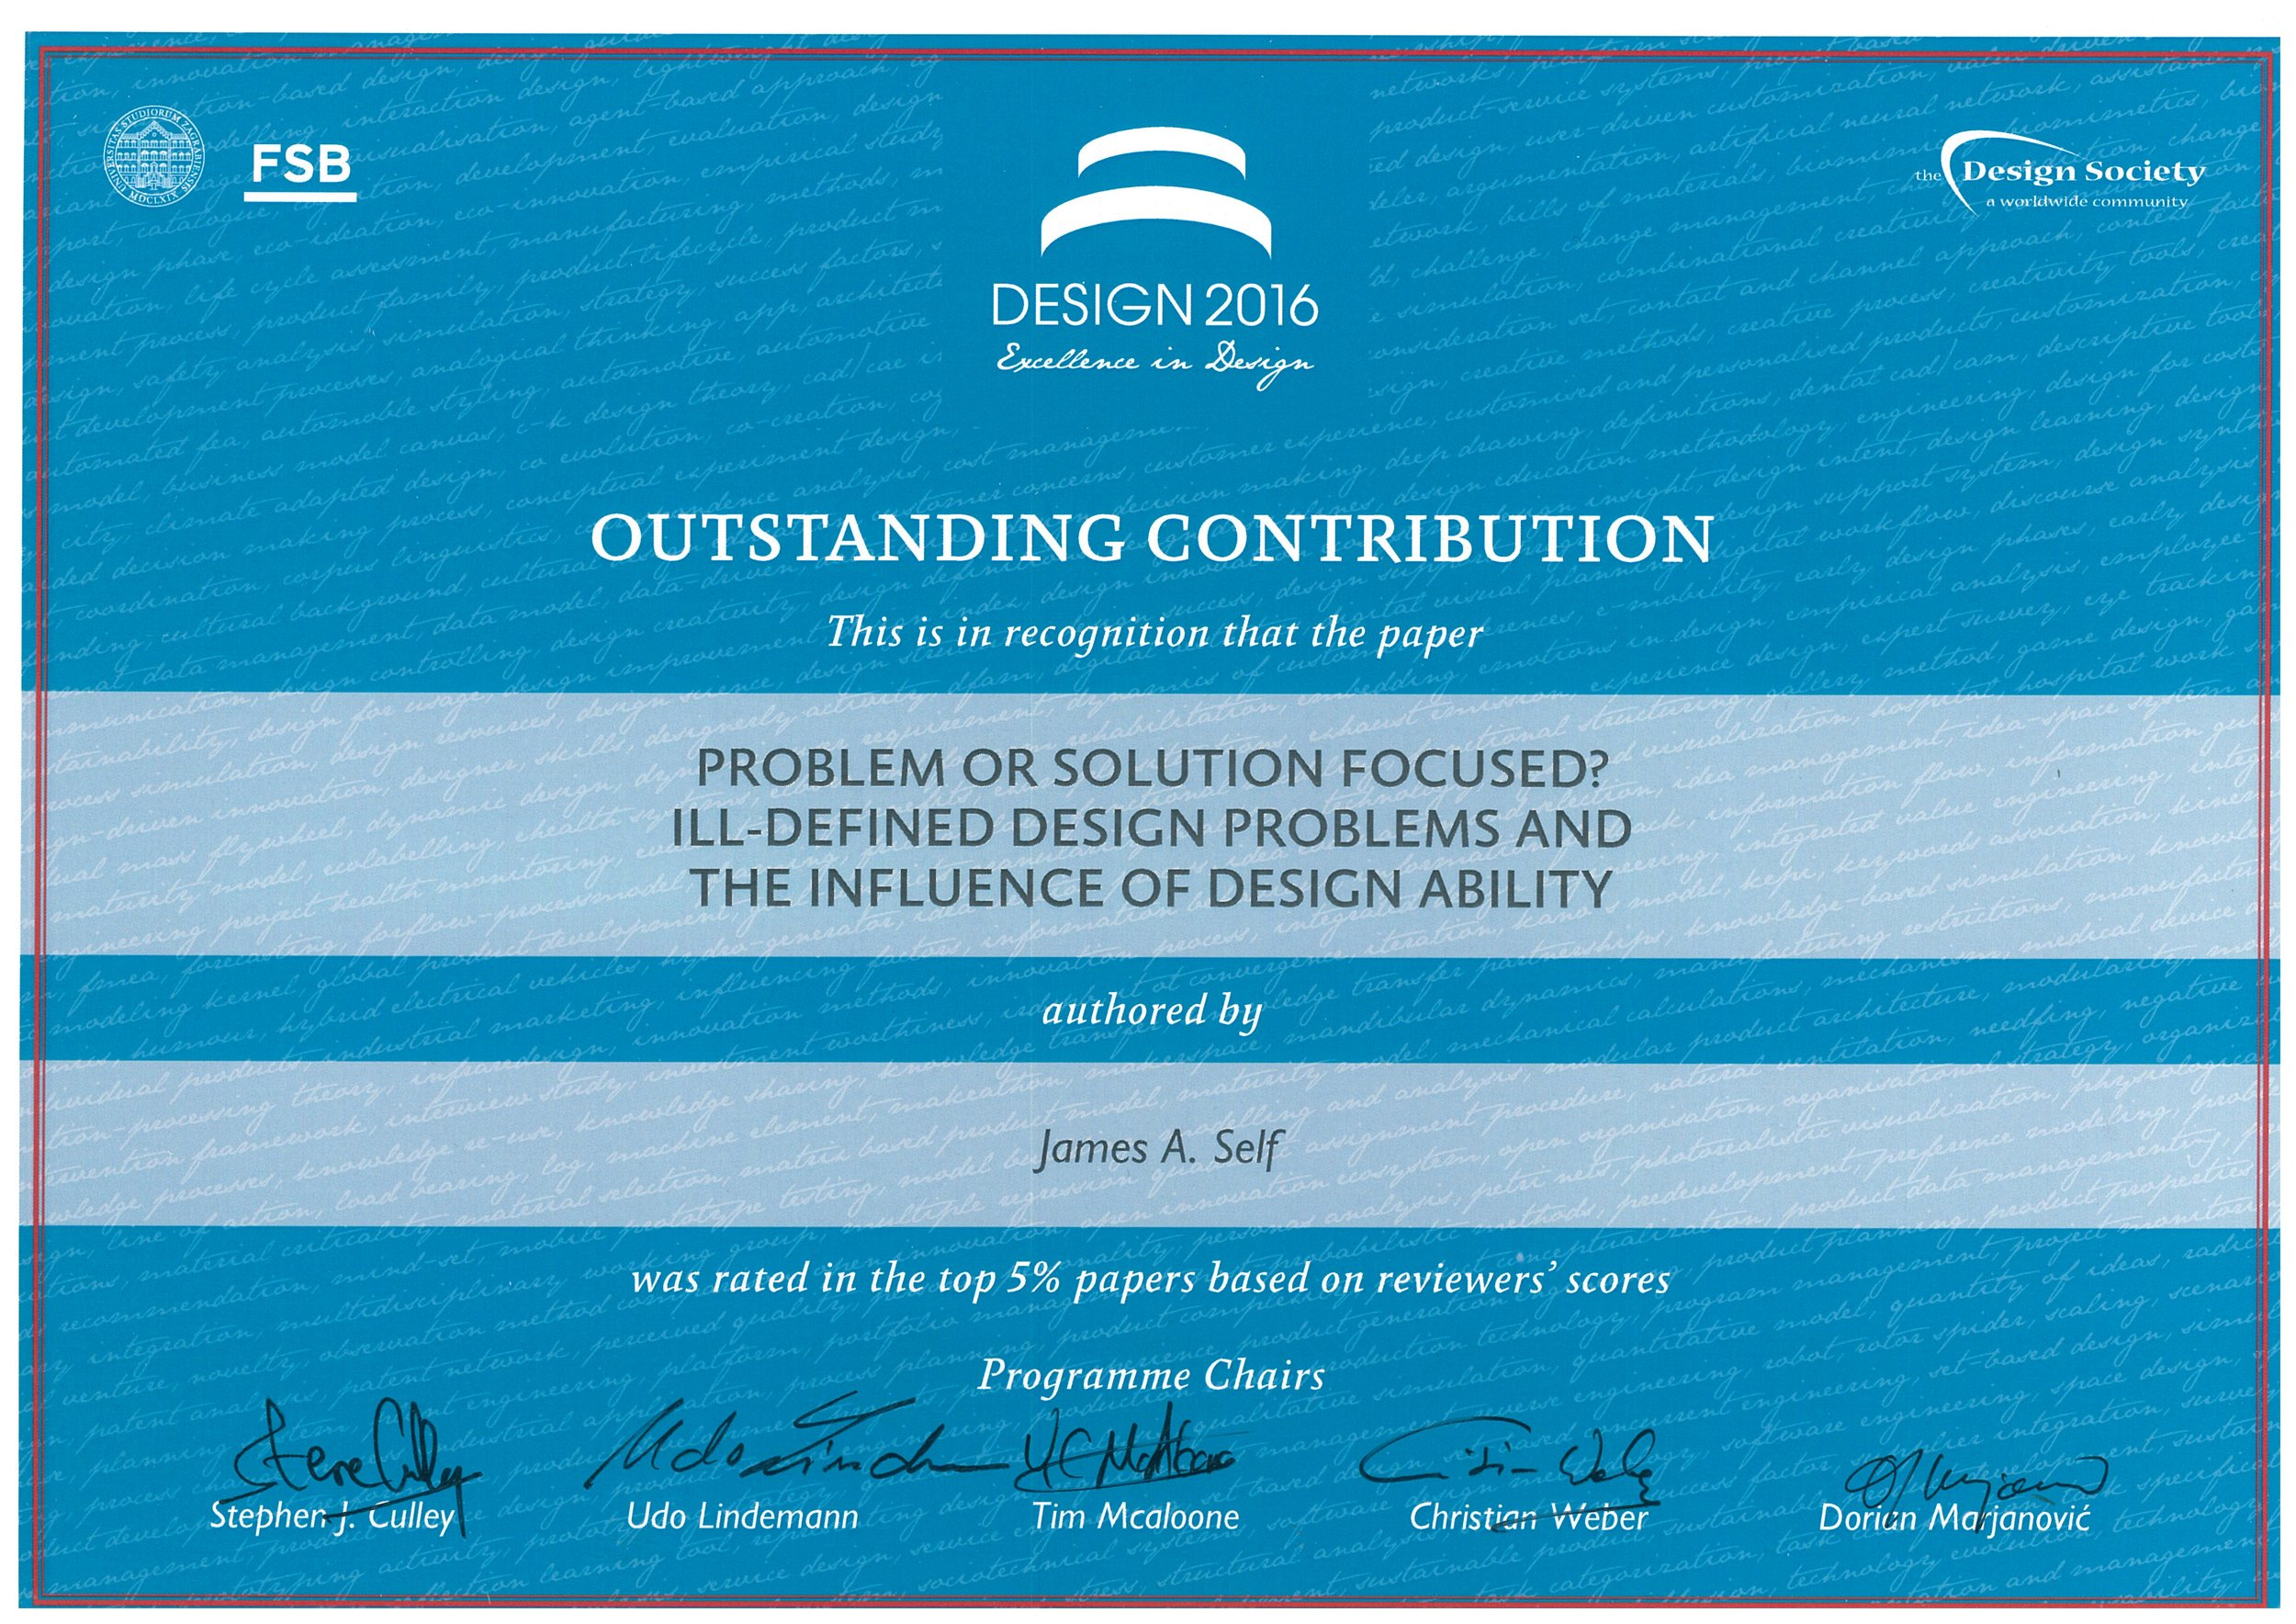 design_society_award_Self.jpg